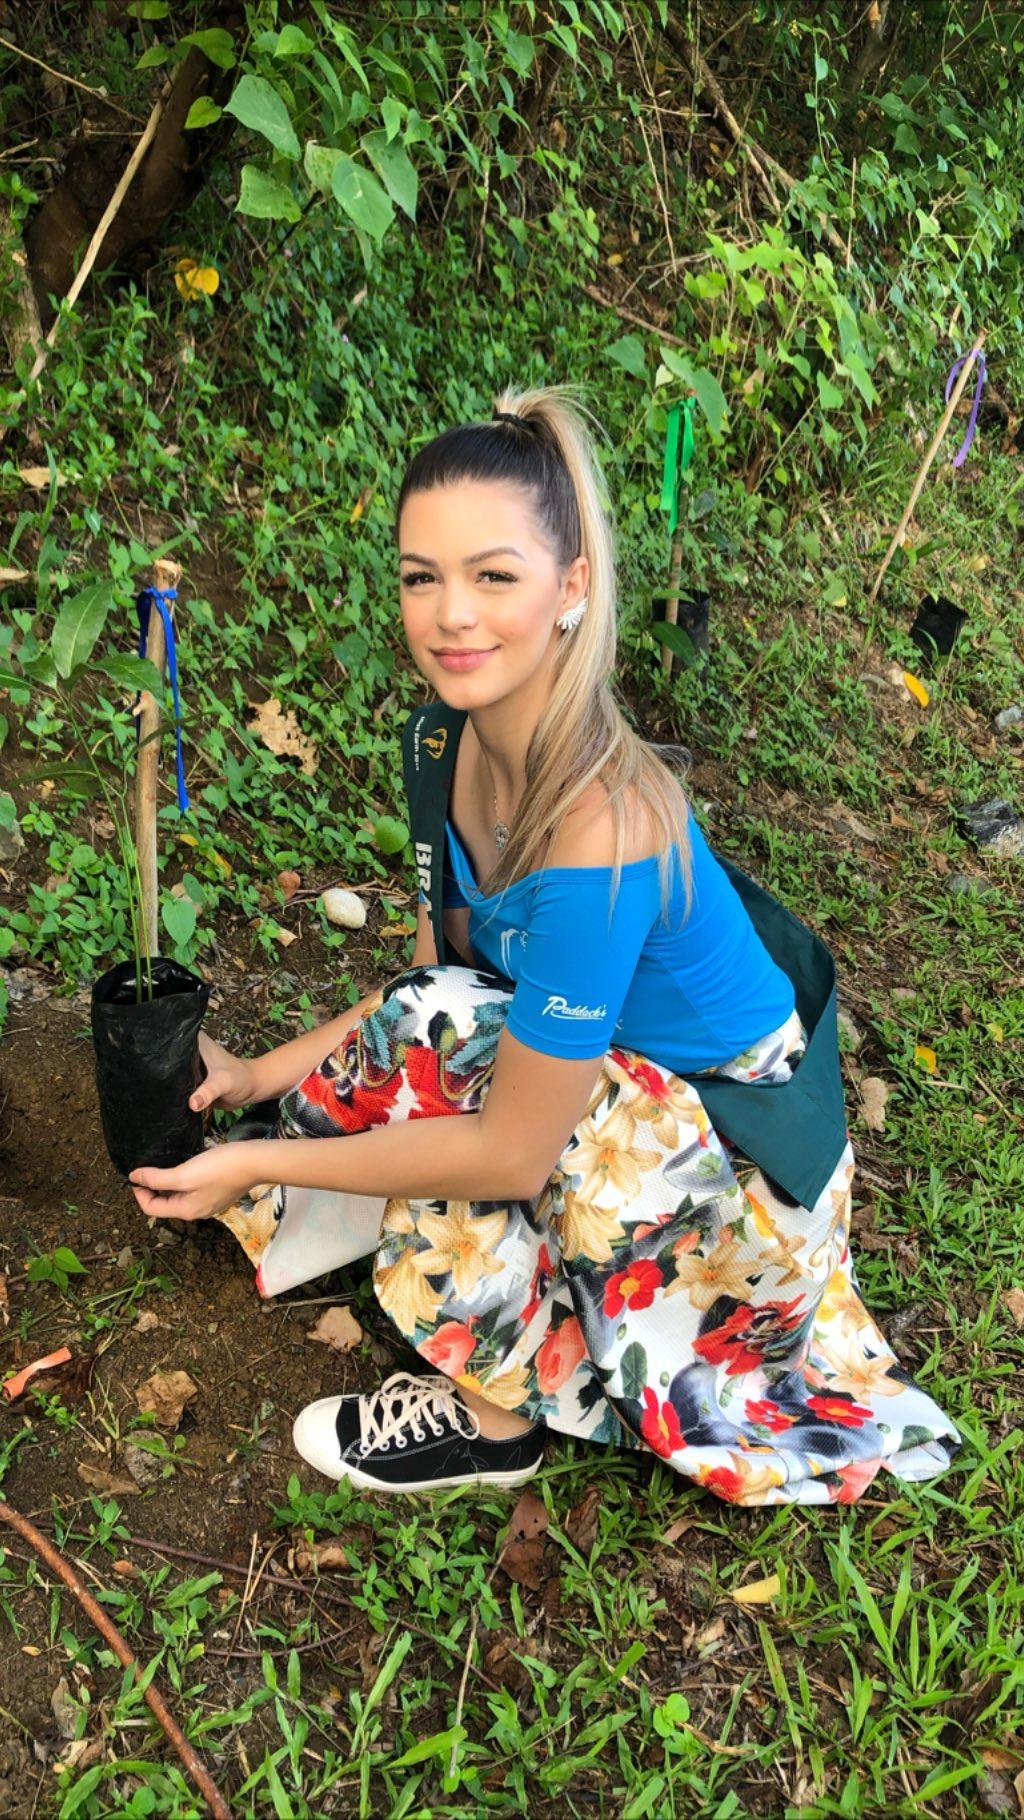 maria gabriela batistela, miss brasil terra 2019. - Página 19 74942710